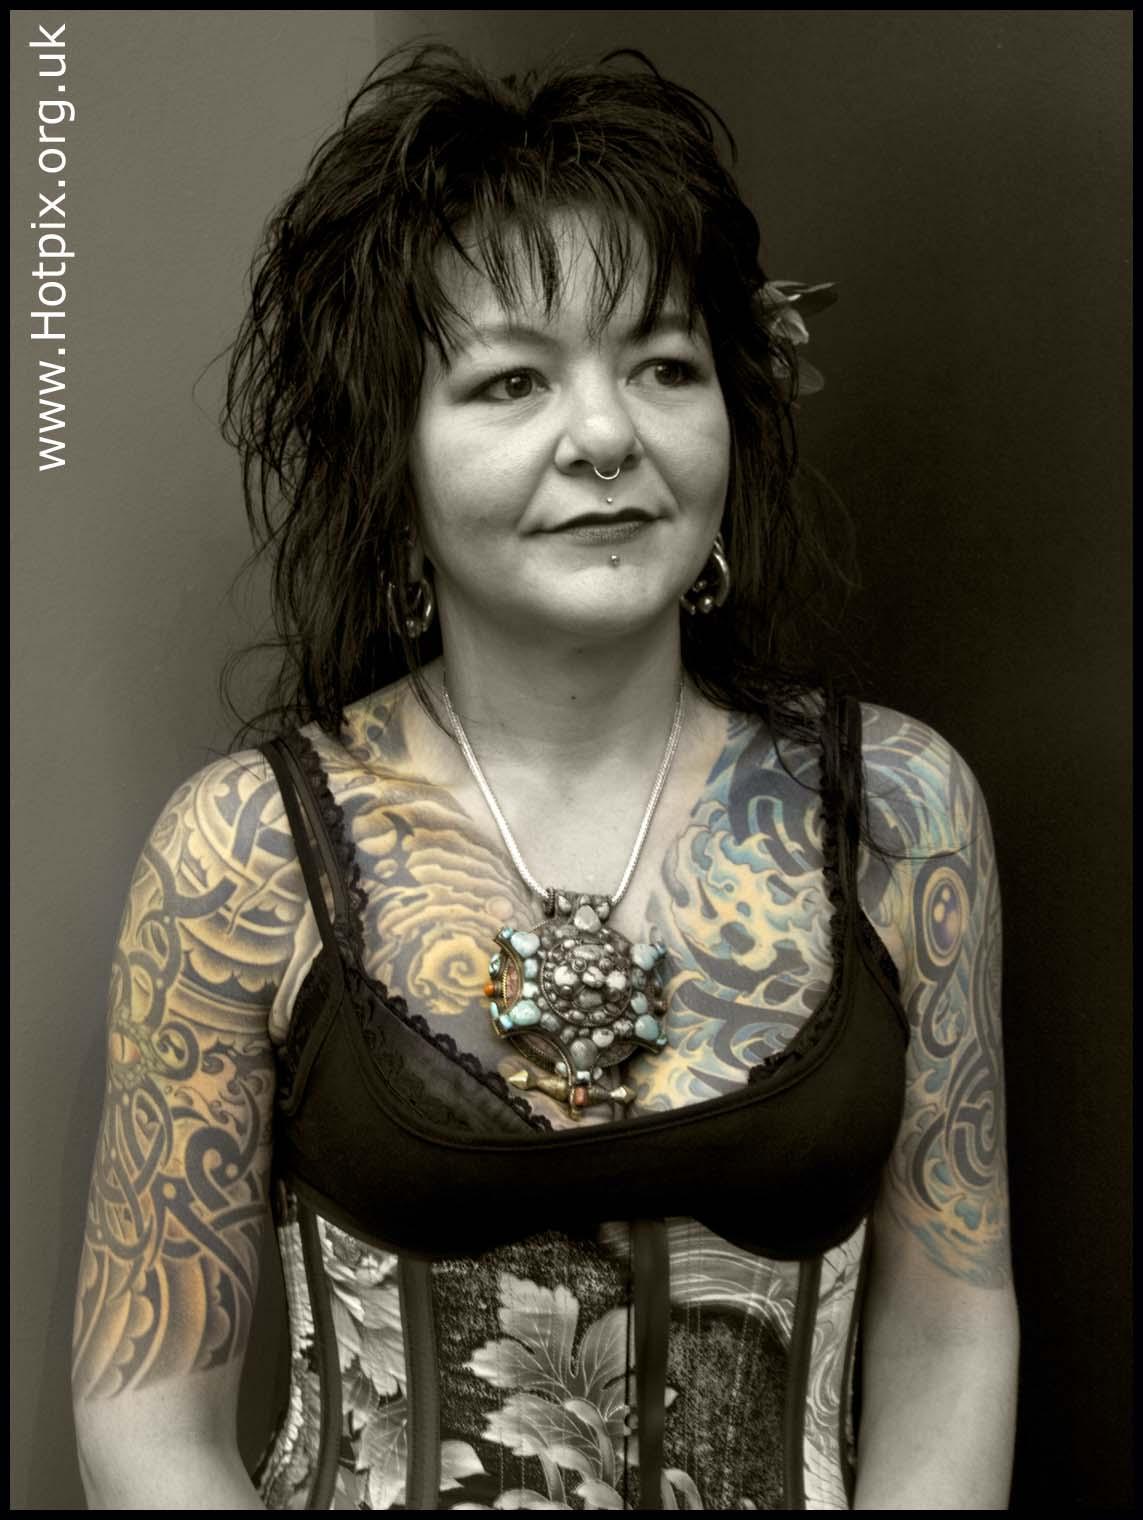 tatoo,sexy,tattoo,attractive,ace,kustom,custom,shop,parlour,tat,tat2,manchester,england,urban,shoulders,selective,color,colour,colores,black,white,portrait,person,people,lady,giry,woman,exotic,ink,skin,needle,flesh,canvas,tonysmith,hotpix,tony,smith,city,cool,image,selctive,Tatuada,tatto,tats,bodyart,body,art,dark,disturbia,tatouage,selectivo,couleur,s\u00e9lective,vorgew\u00e4hlte,Farbe,sensual,hotpicks,muchacha,femenina,de,la,mujer,se\u00f1ora,female,girl,\u5973\u6027\u30e1\u30b9\u306e\u5973\u6027\u306e\u5973\u306e\u5b50,\u592b\u4eba\u5973\u6027\u5987\u5973\u5973\u5b69,fille,f\u00e9minine,femme,dame,tony smith photography,tdktonysmith,@hotpixuk